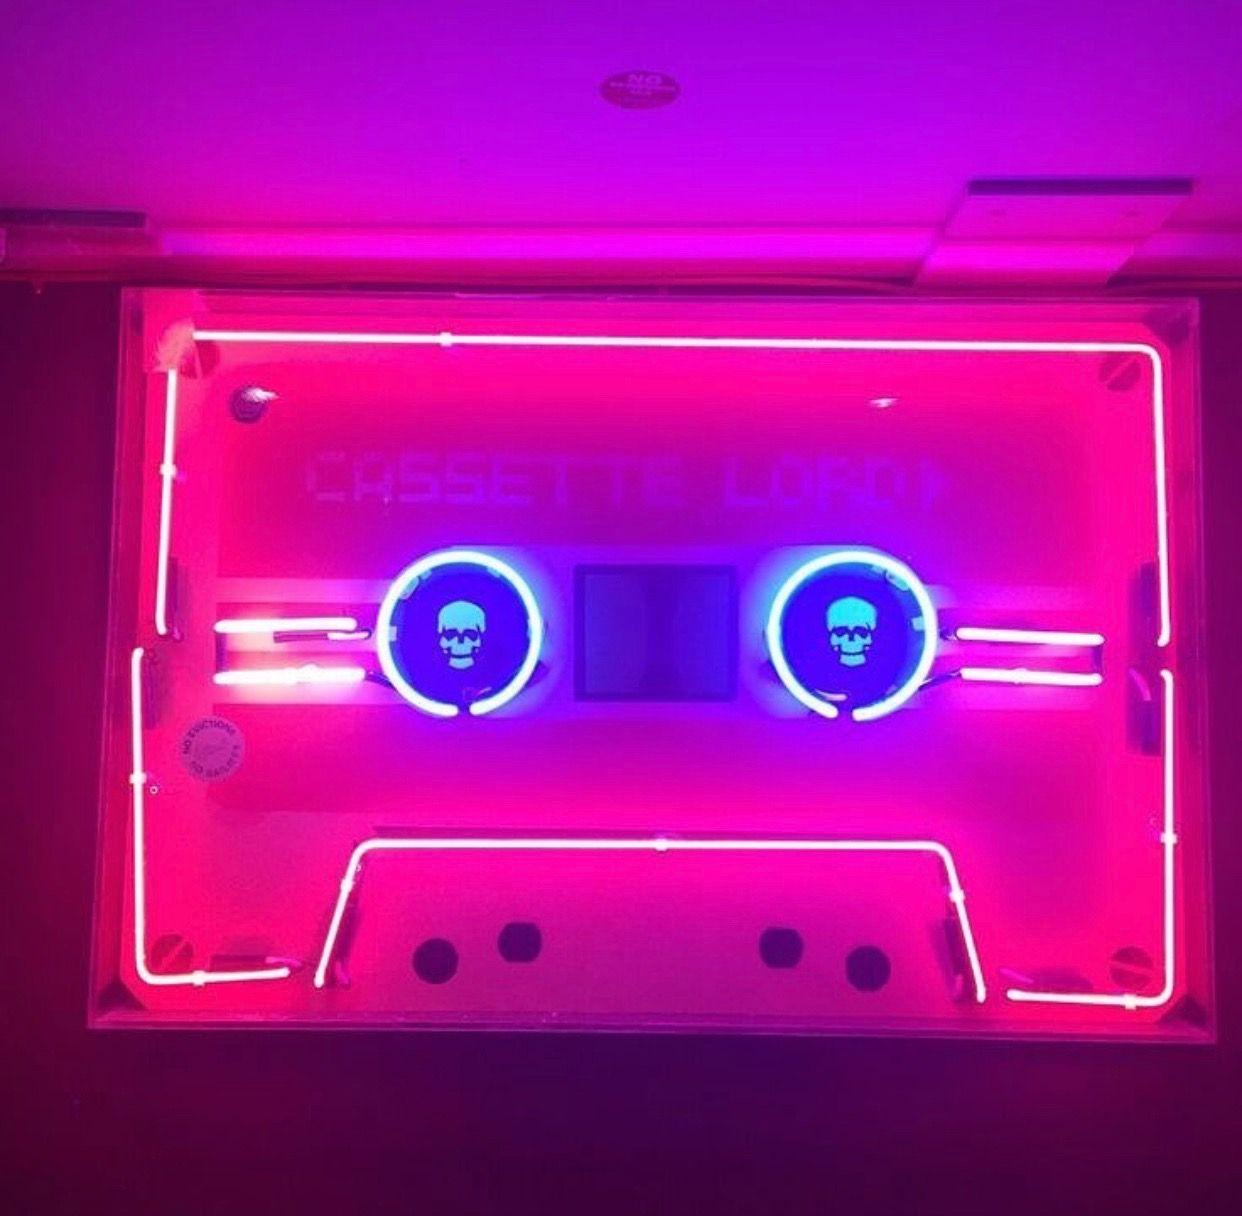 Pin by LEF on Neon in 2019 Neon lighting, Neon nights